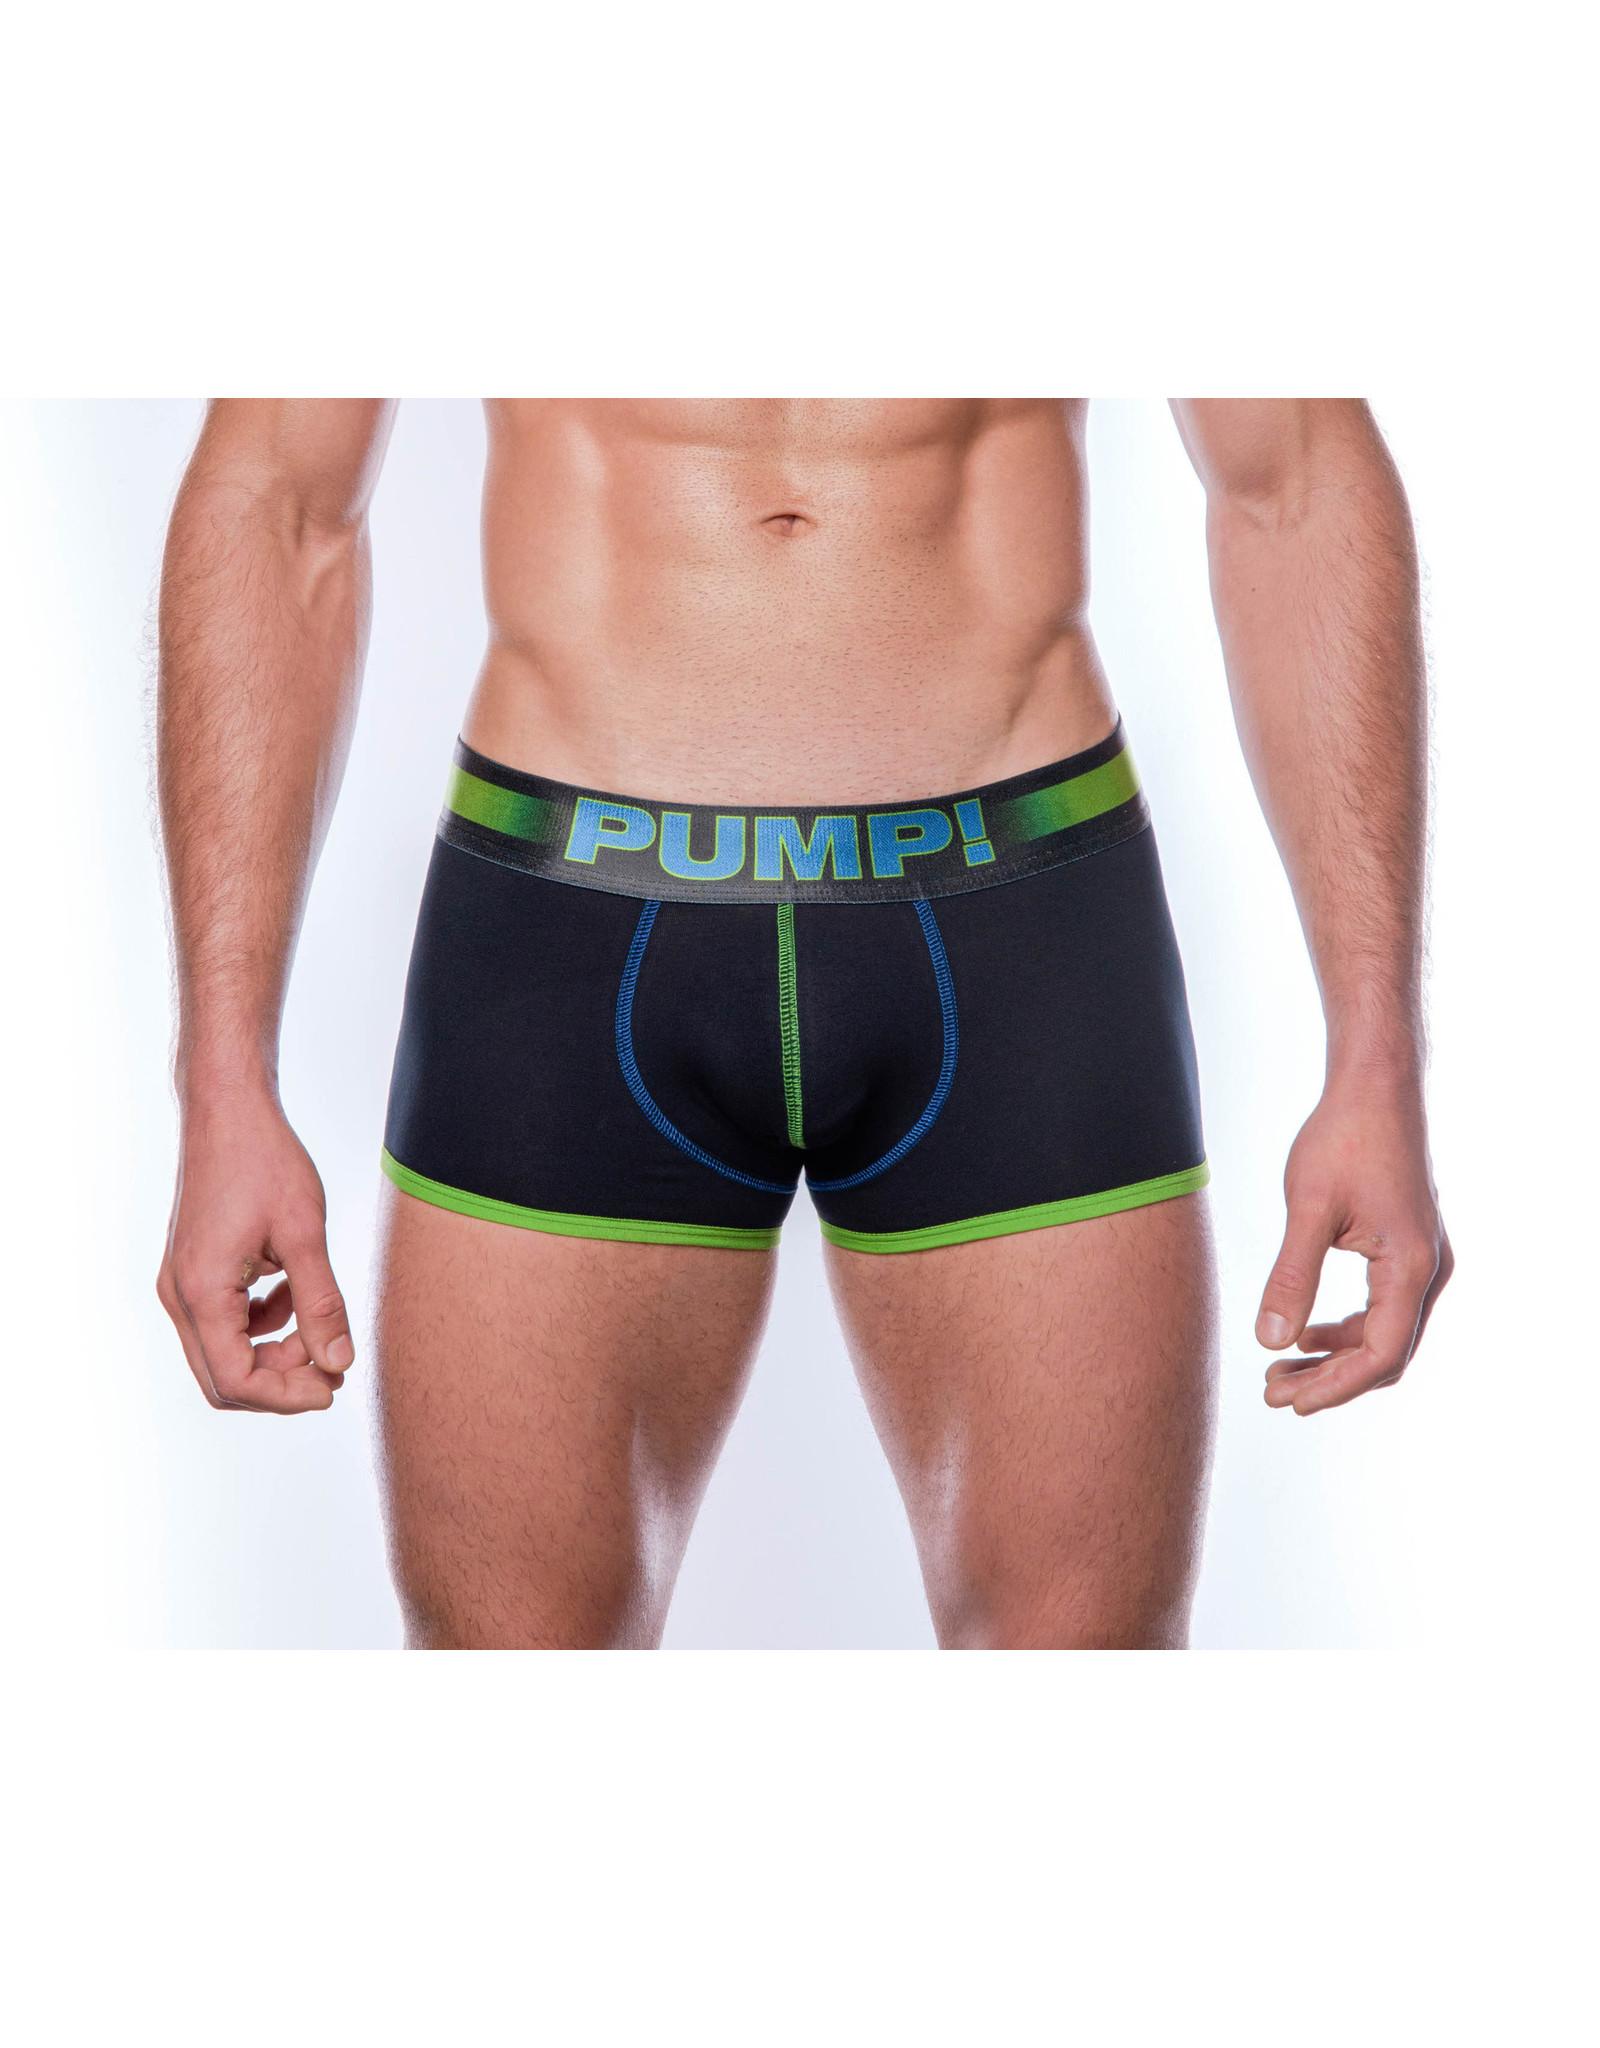 PUMP! PUMP! PLAY Green Boxer